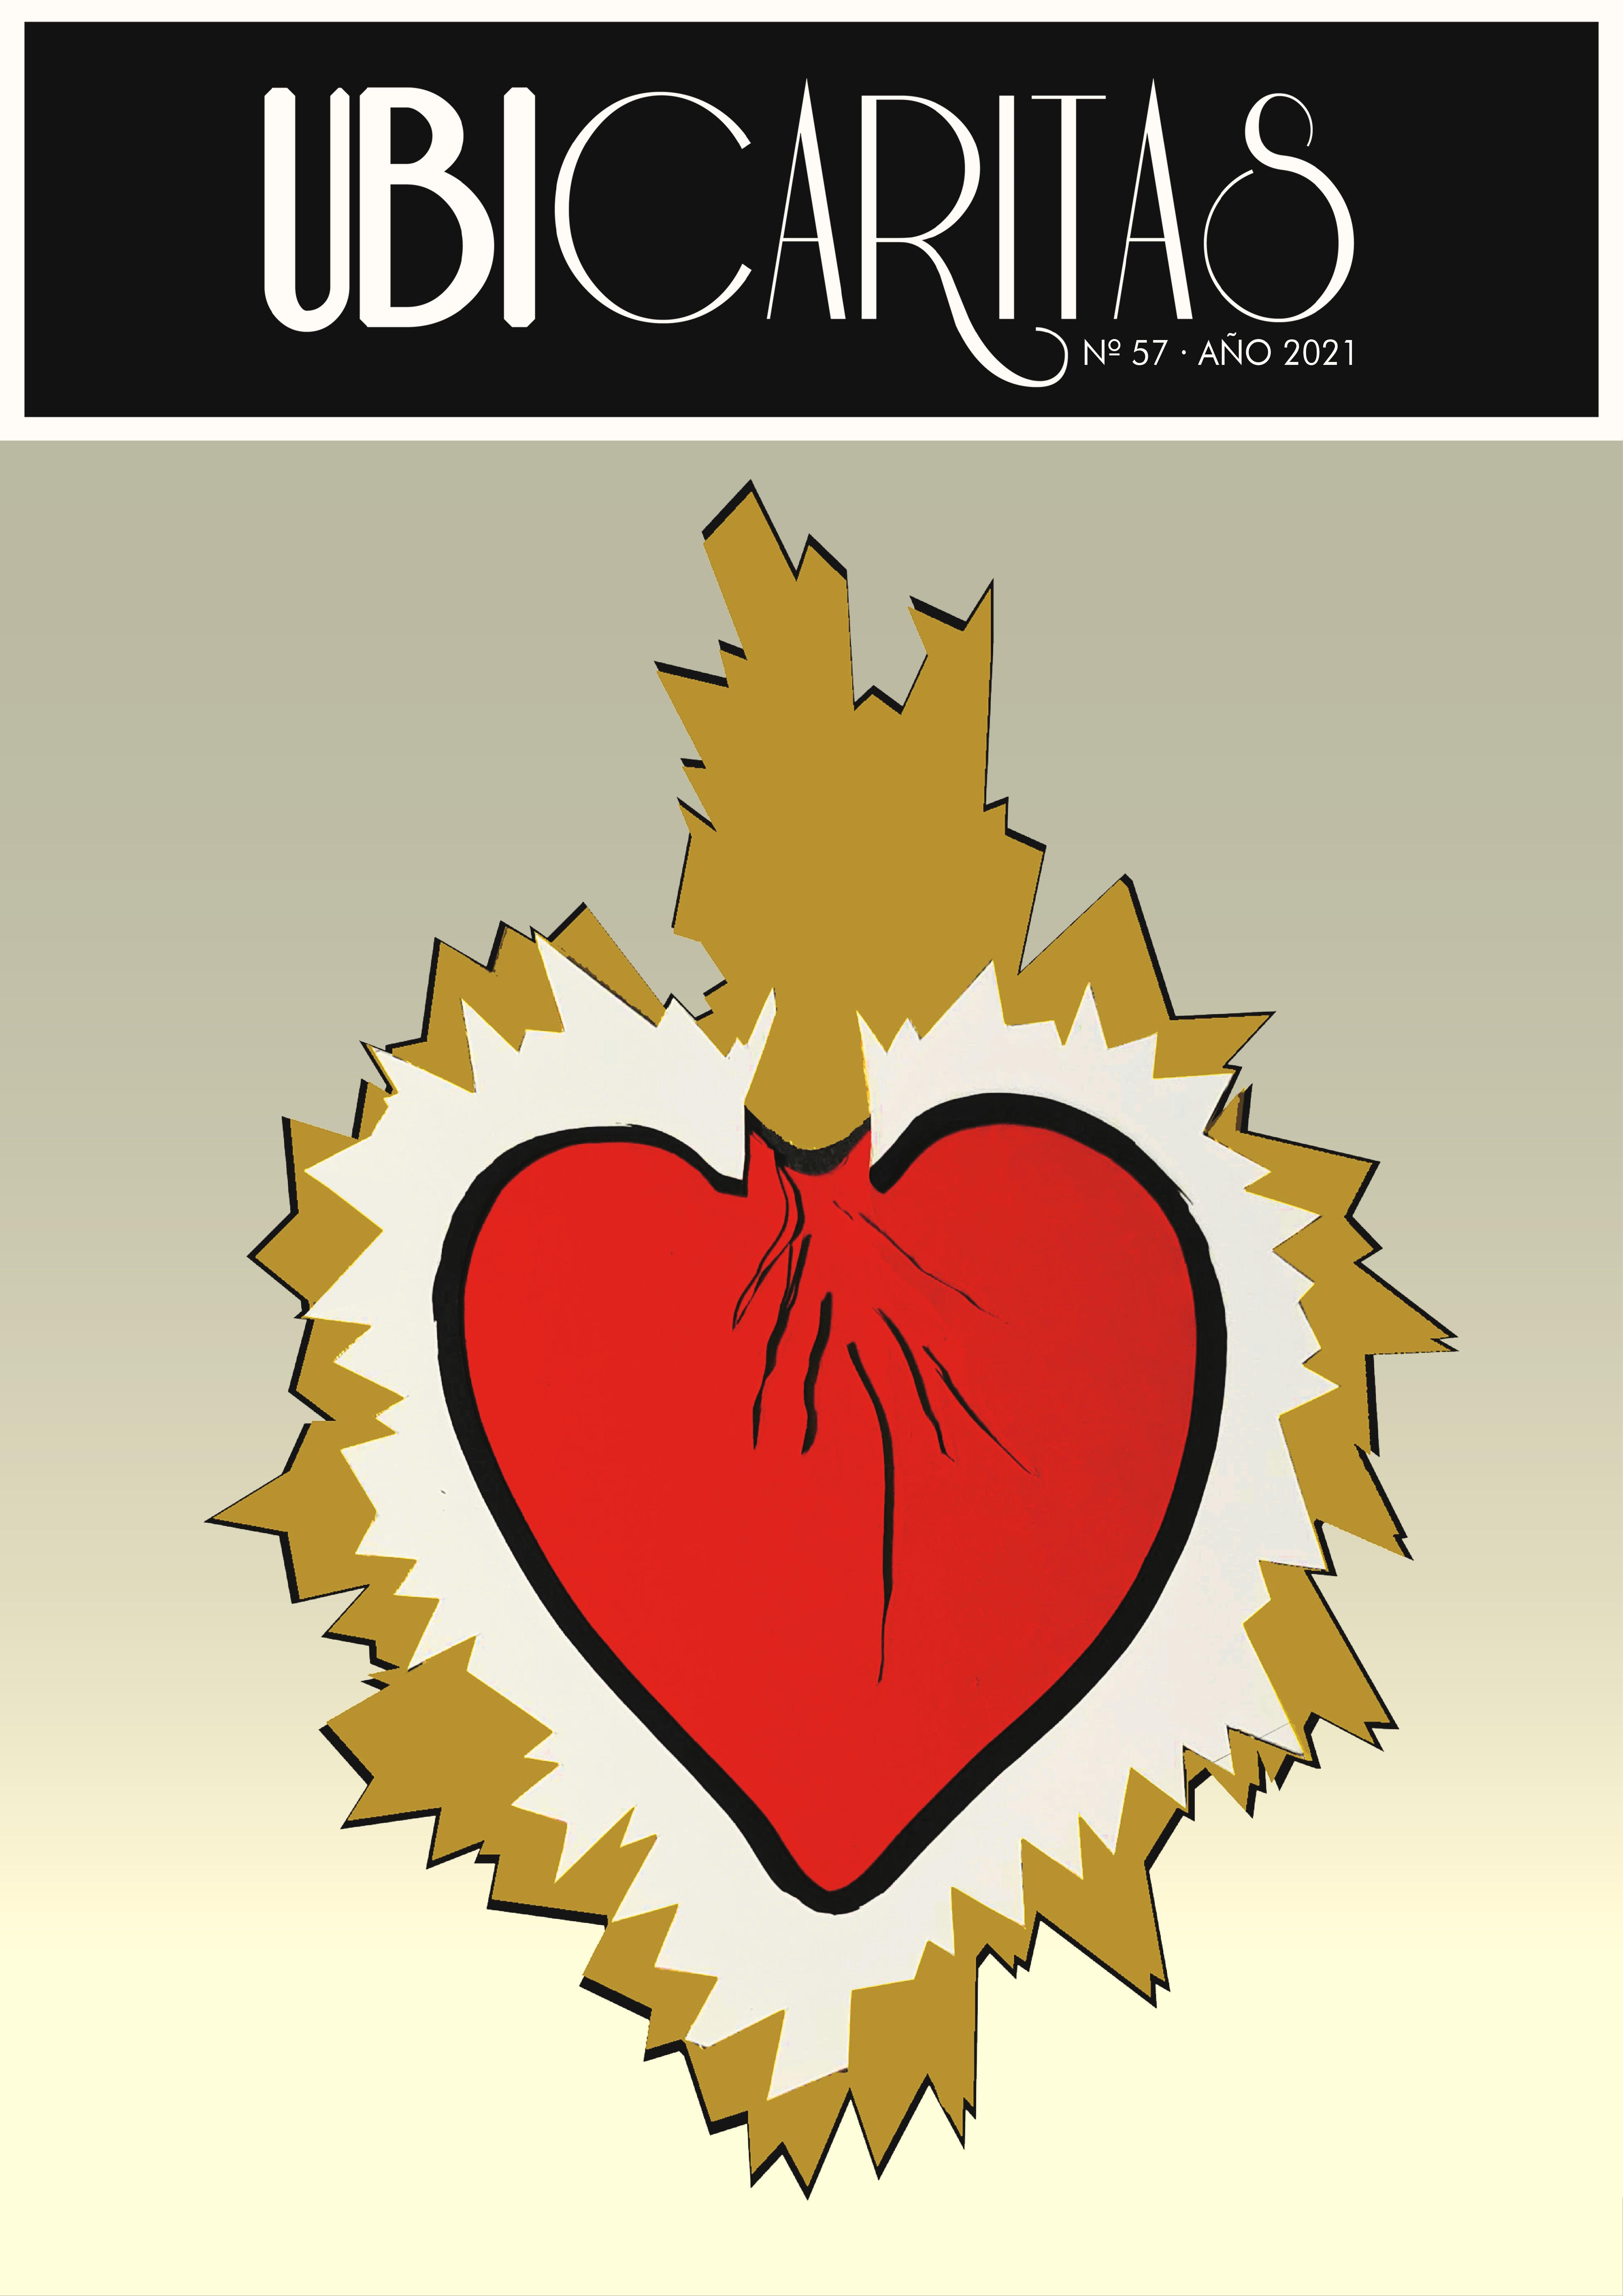 Boletín Ubi Caritas 2021